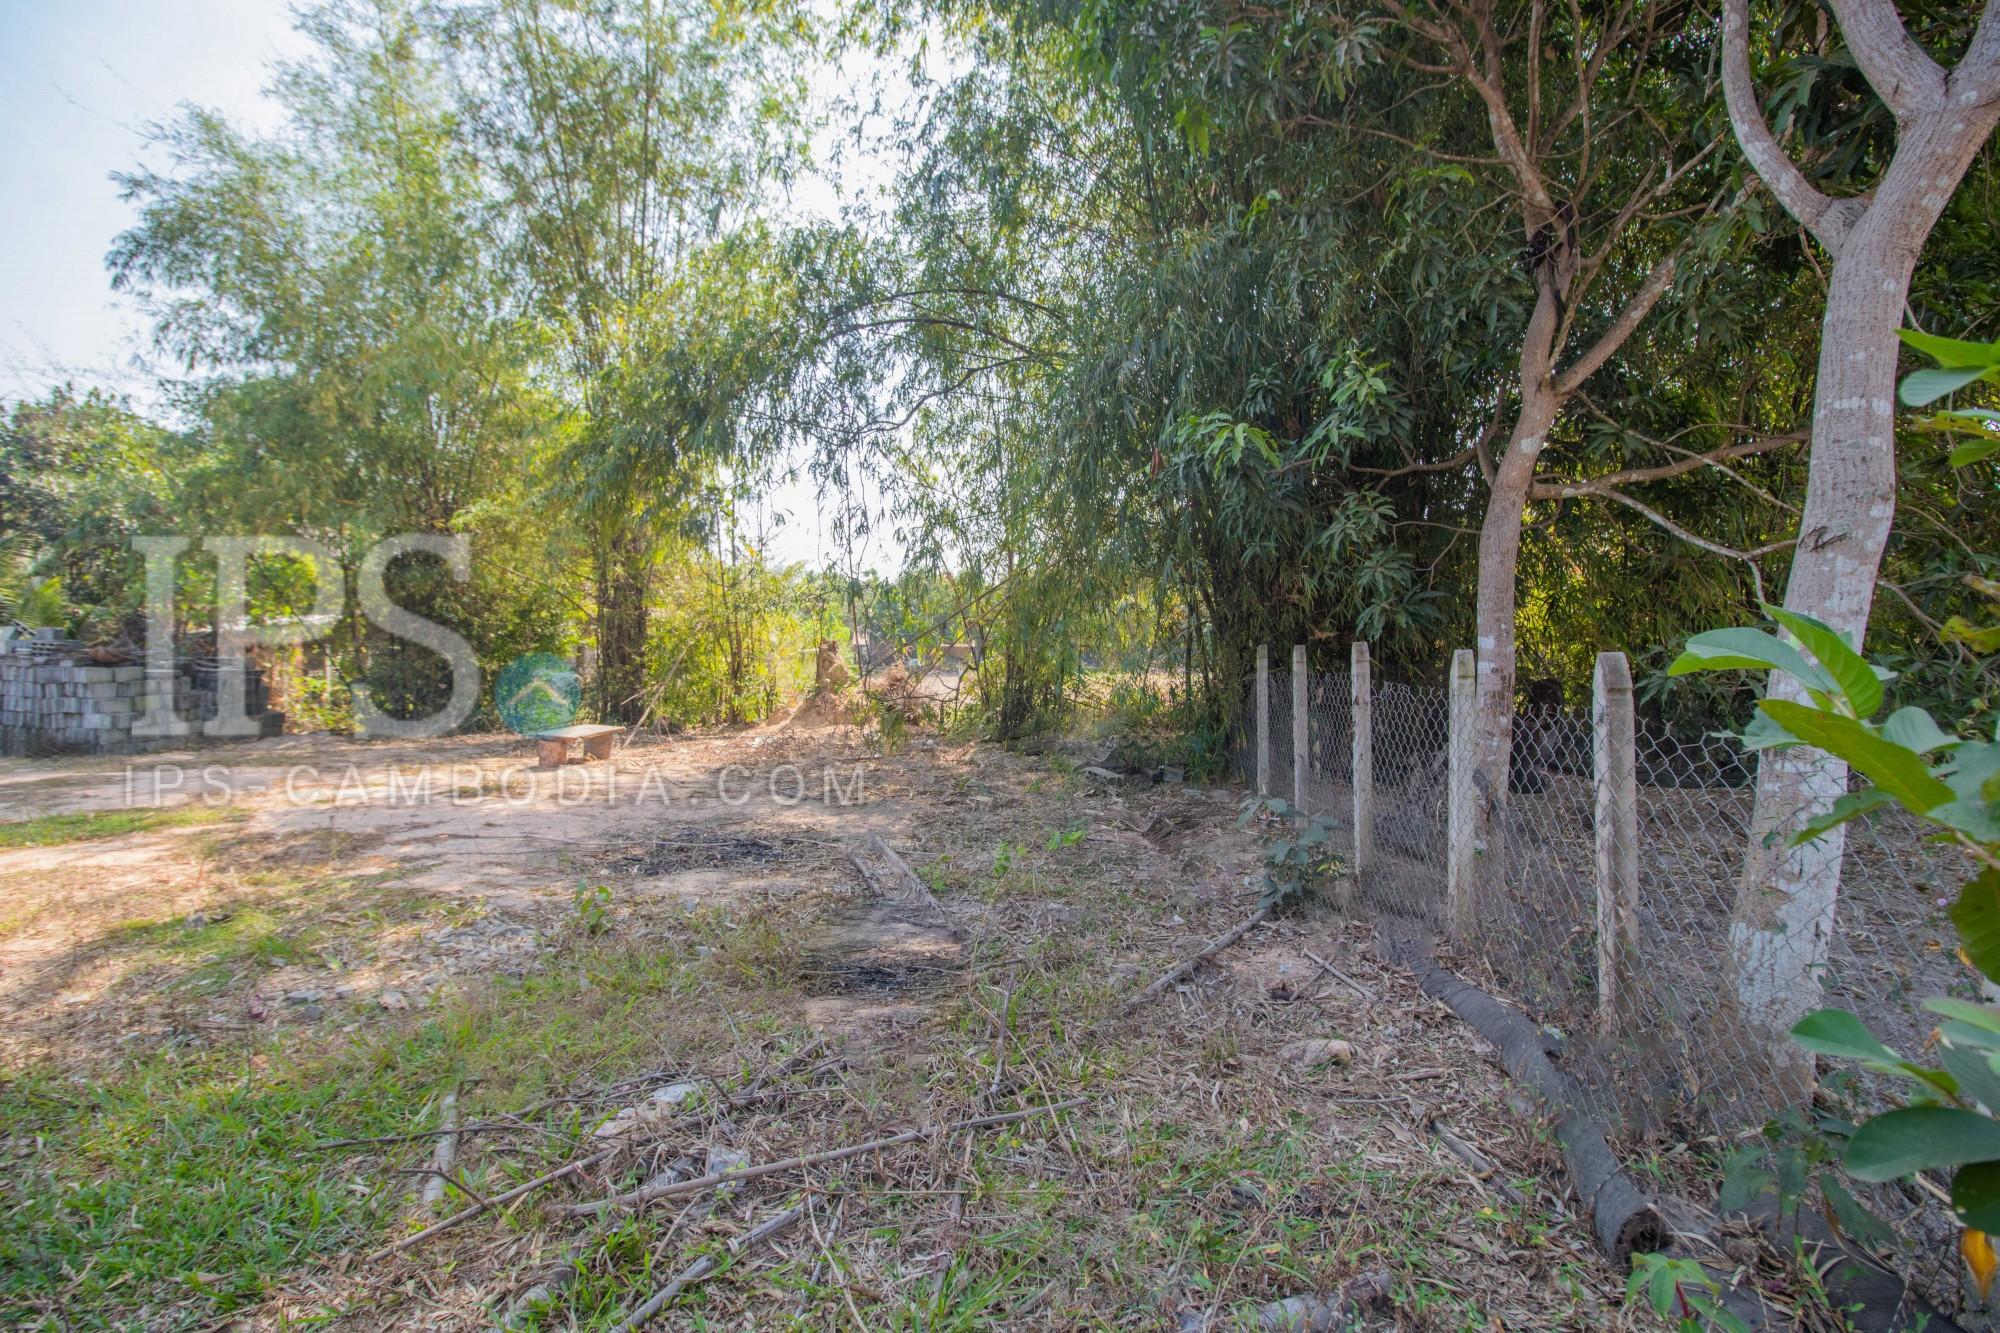 578 Sqm Land For Sale - Sambour, Siem Reap